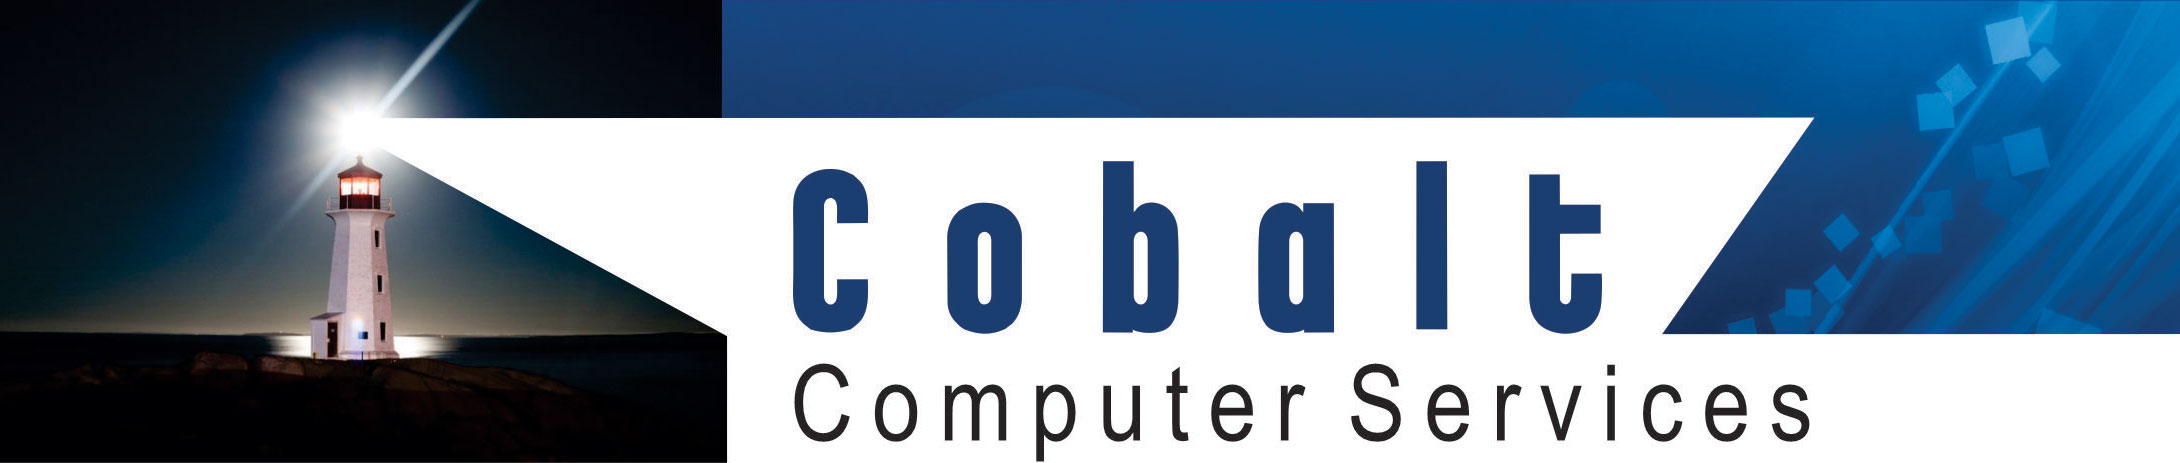 Cobalt Computer Services Inc.